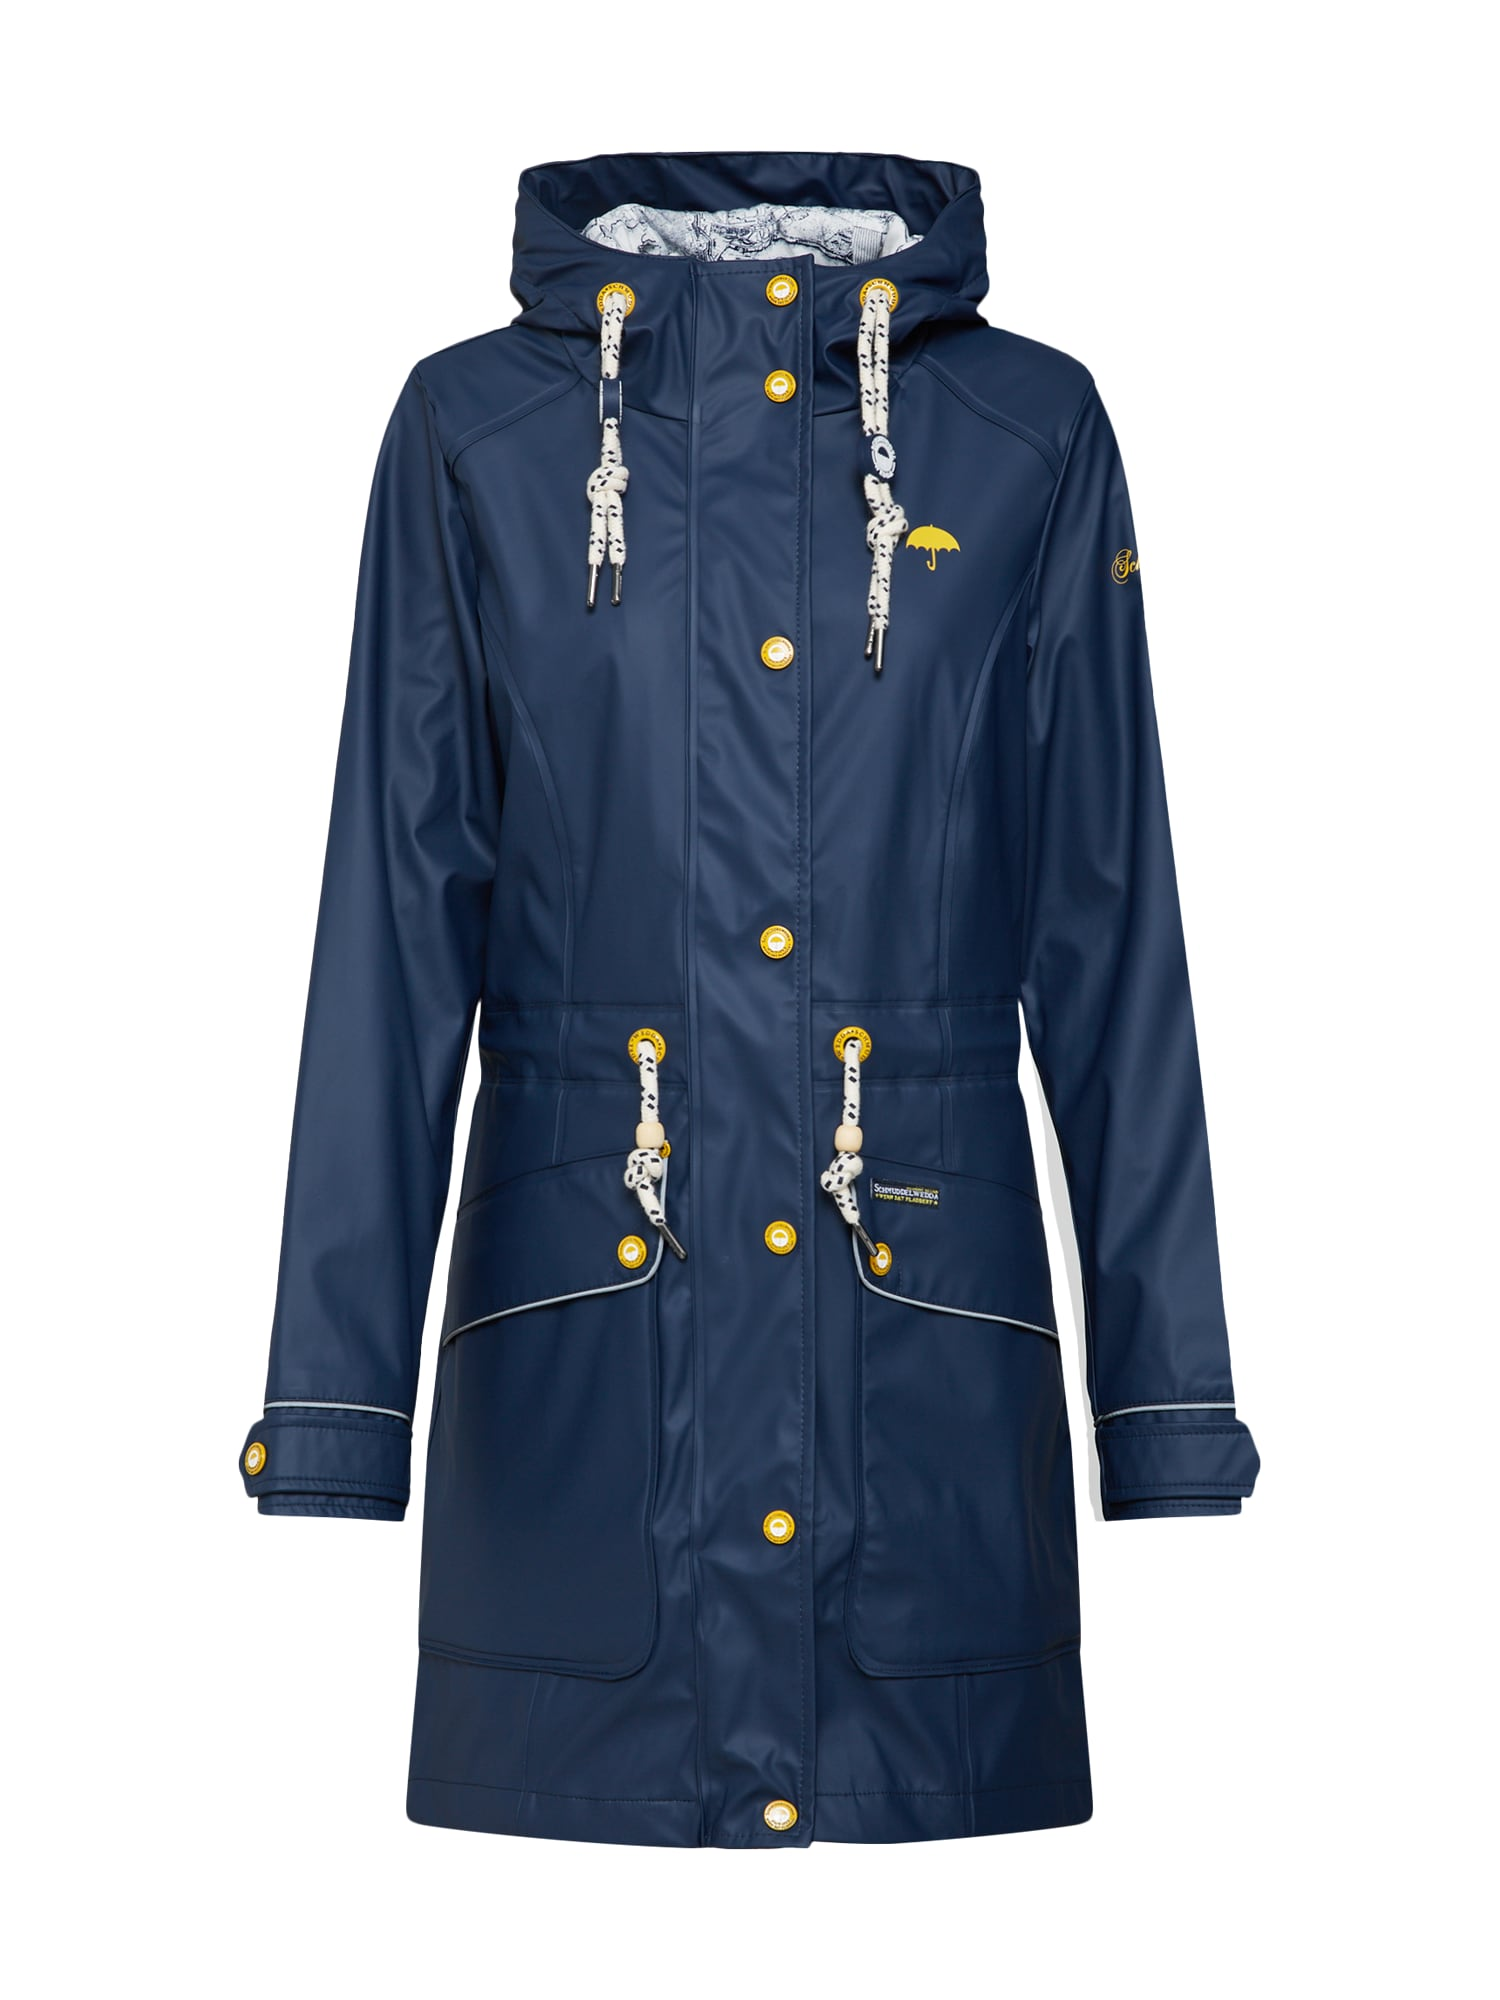 Přechodný kabát marine modrá Schmuddelwedda